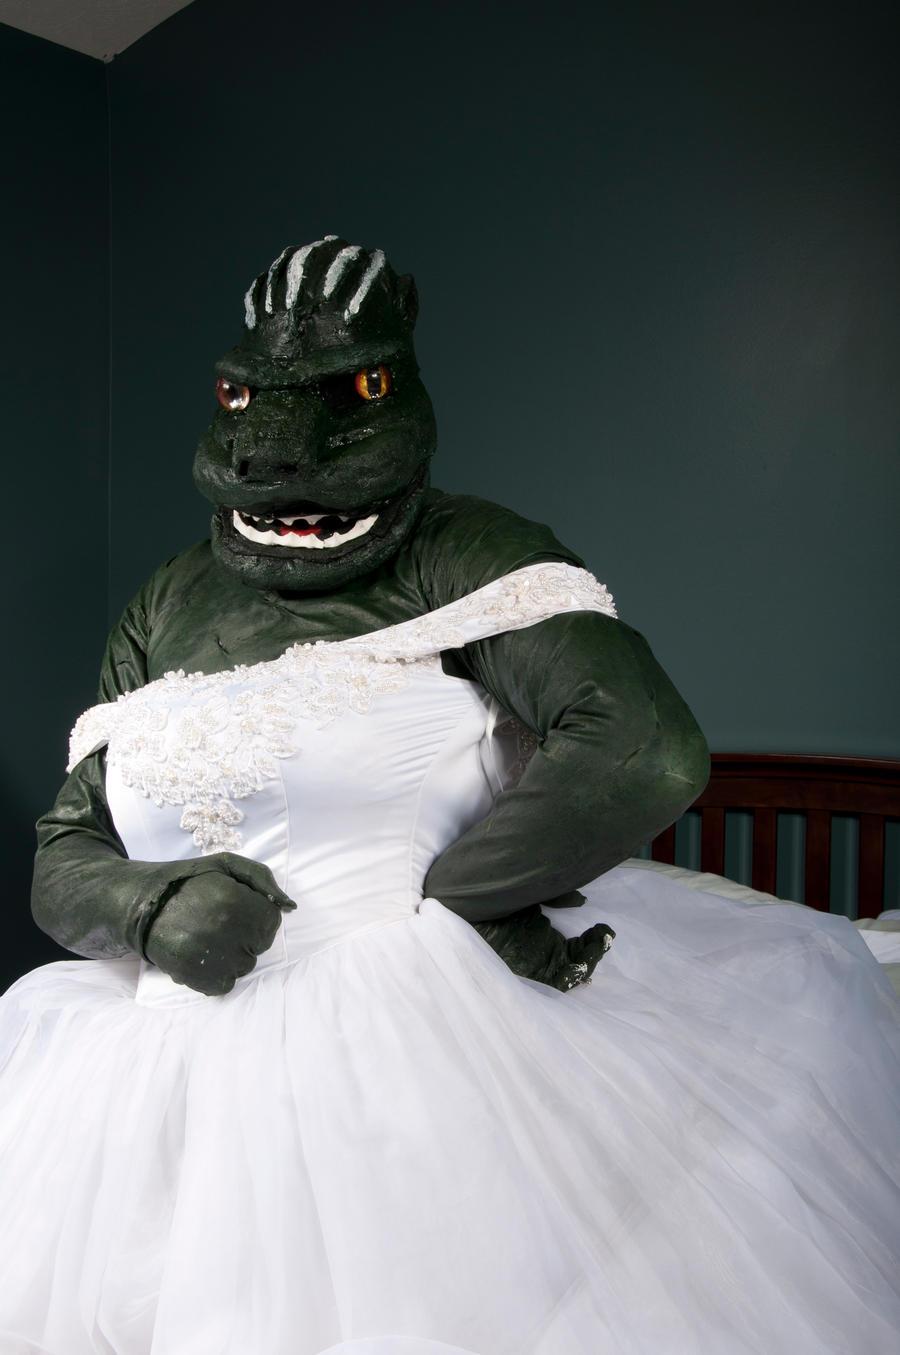 Bridezilla by PhantomChicken